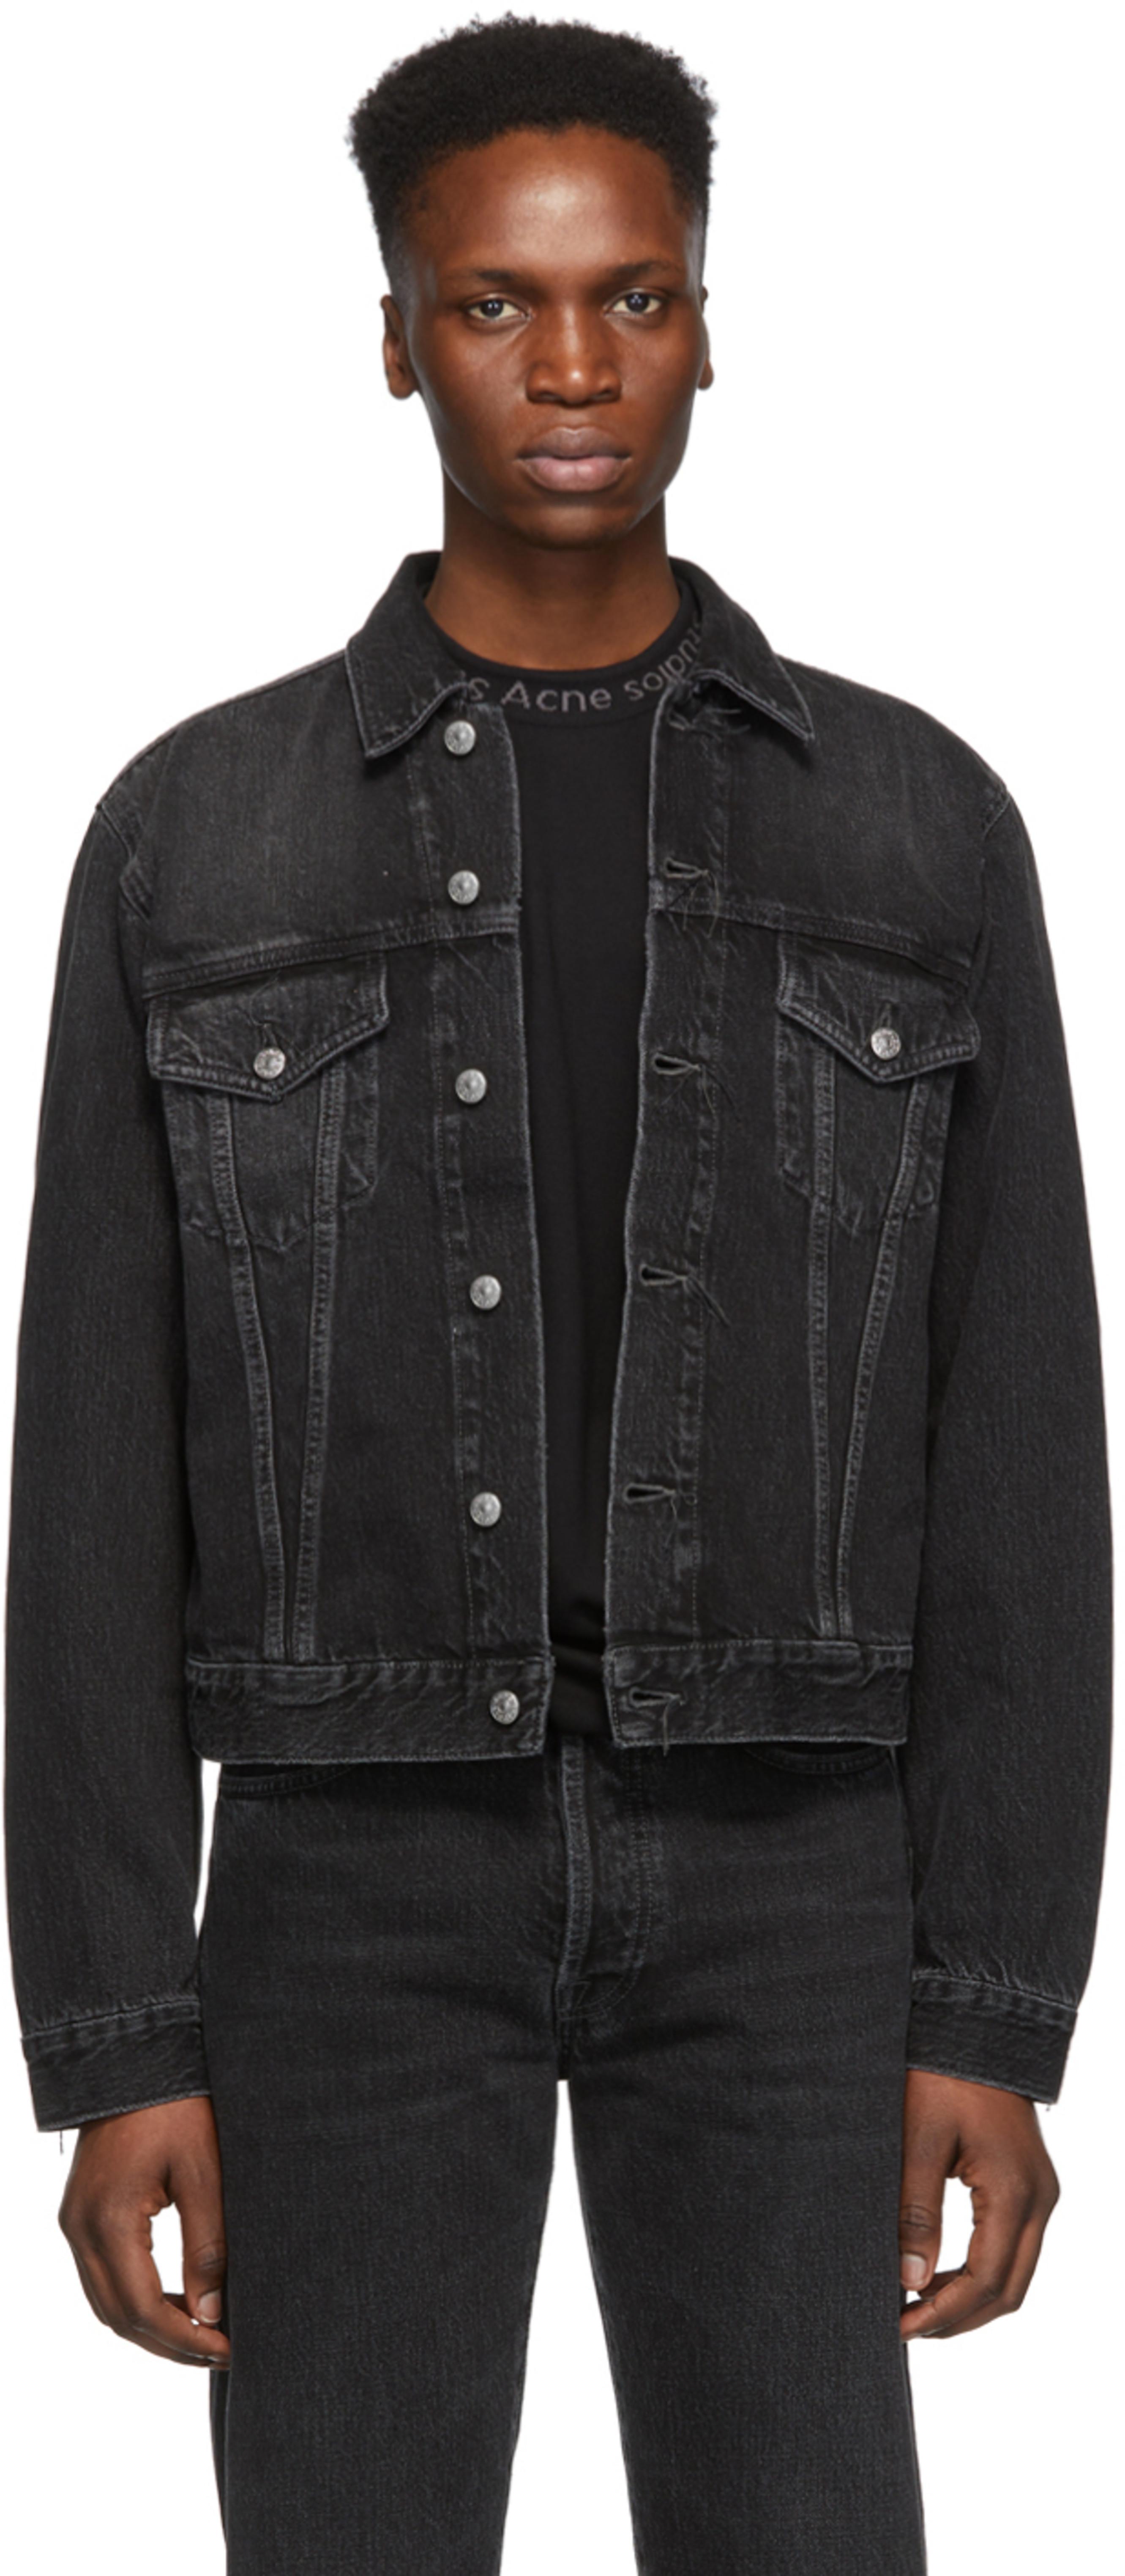 fc069f6a2 黑色 Blå Konst 1998 Metal 牛仔夹克